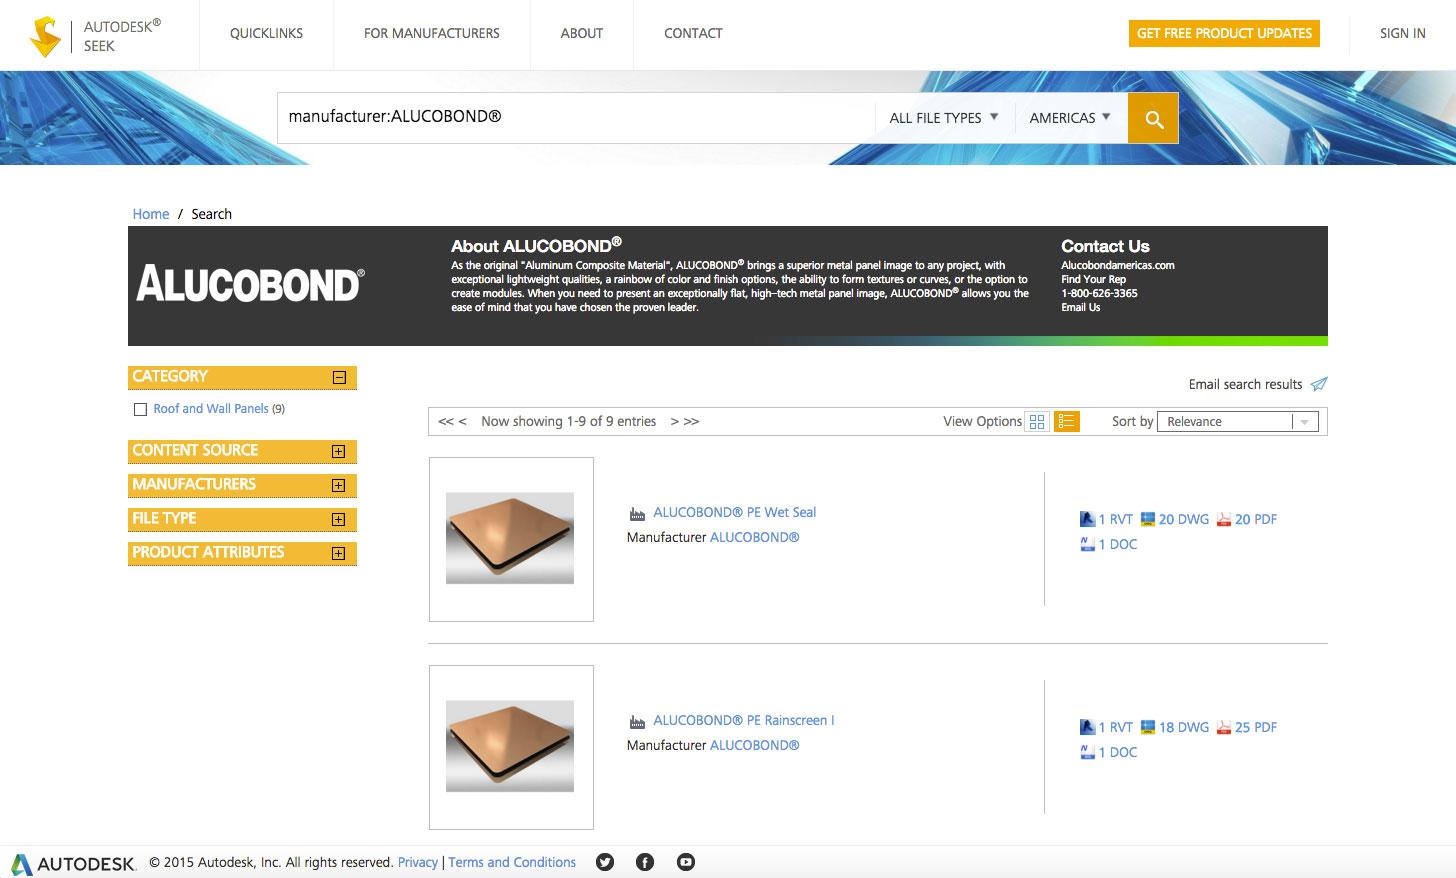 alucobond aluminum composite material 3d bim files now available on rh alucobondusa com autodesk seek revit lt autodesk seek login